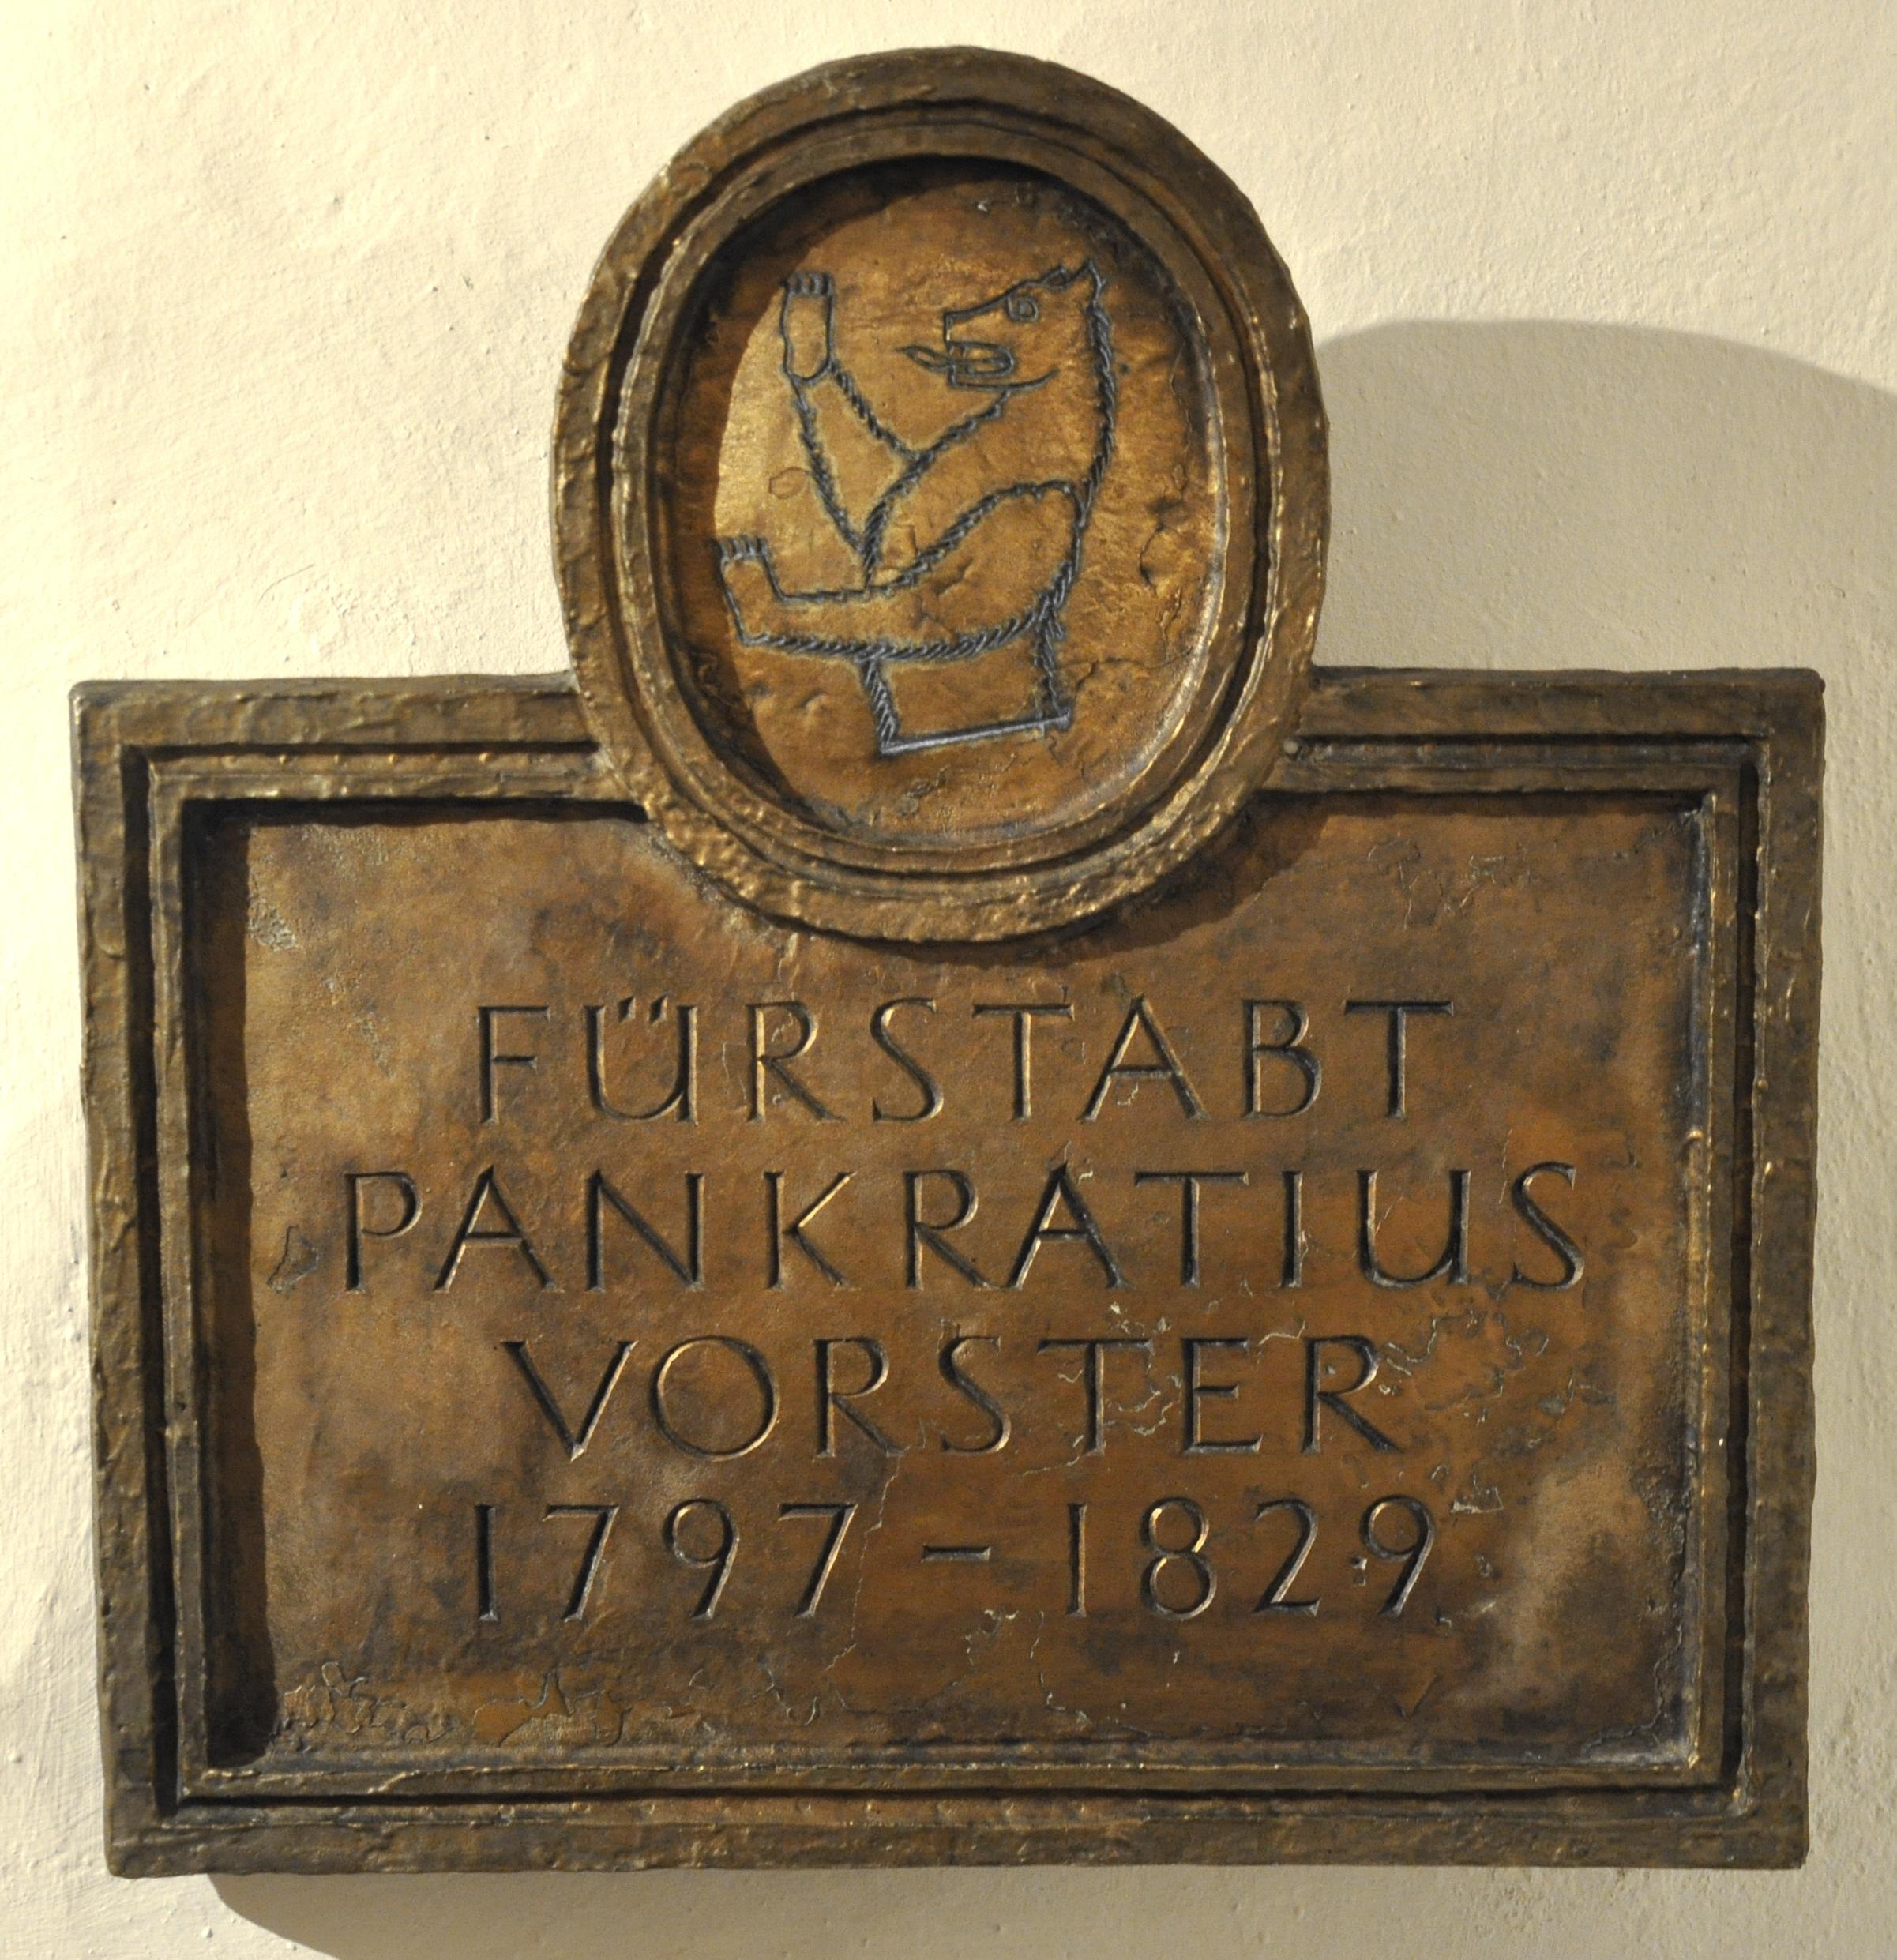 St_Gallen_Stiftskirche_Ostkrypta_Grab_3_Pankraz_img02.jpg Vorster